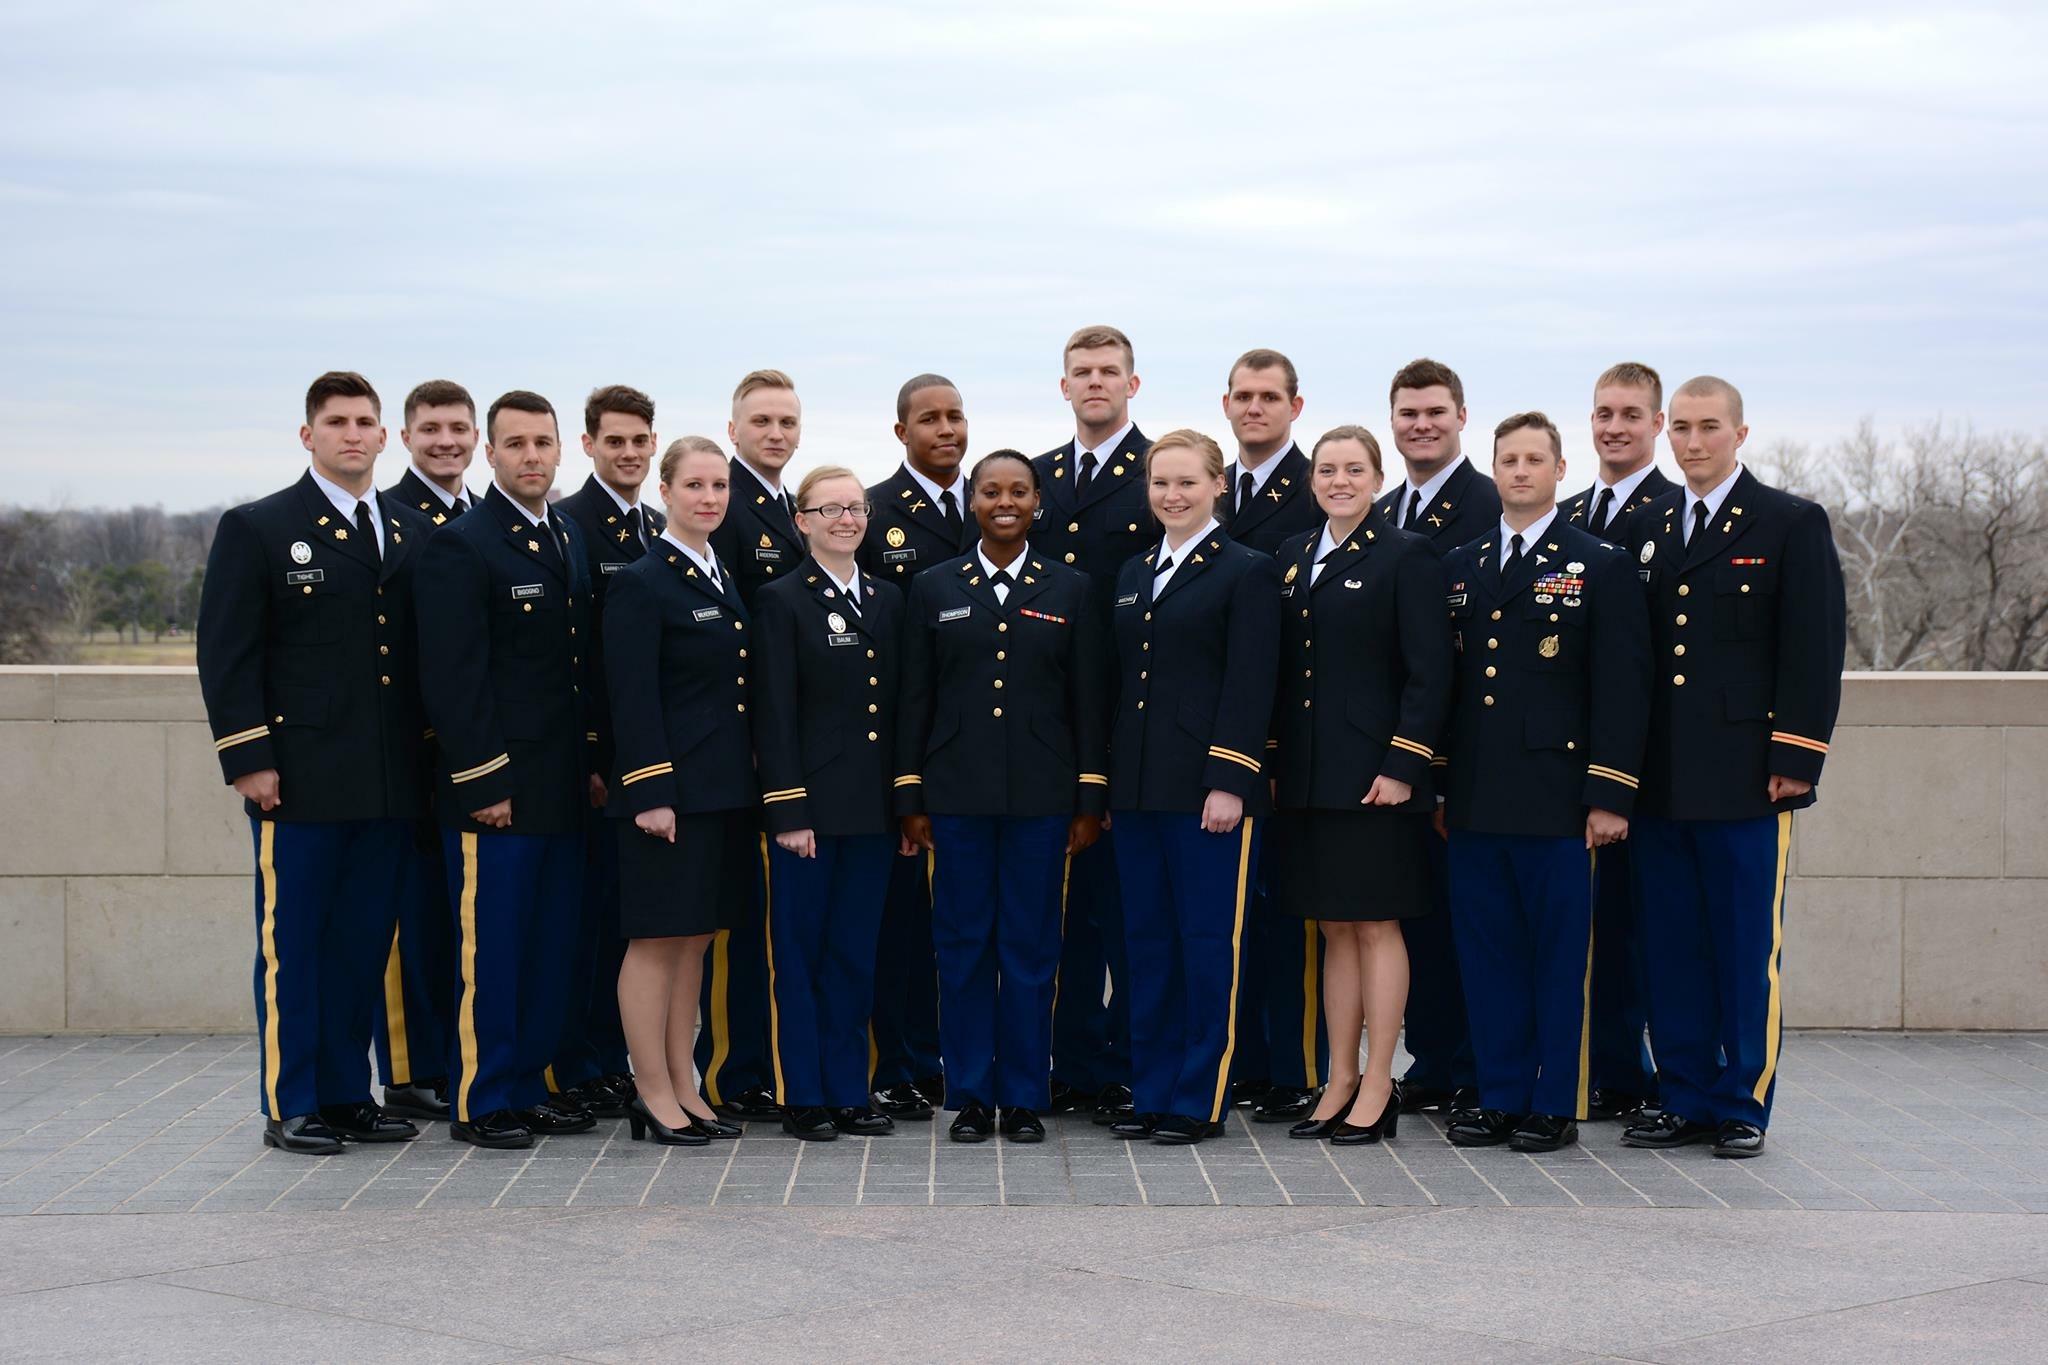 Bryan Schroeder >> Past Alumni by Year | Gateway Battalion | St. Louis Army ROTC | Washington University in St. Louis